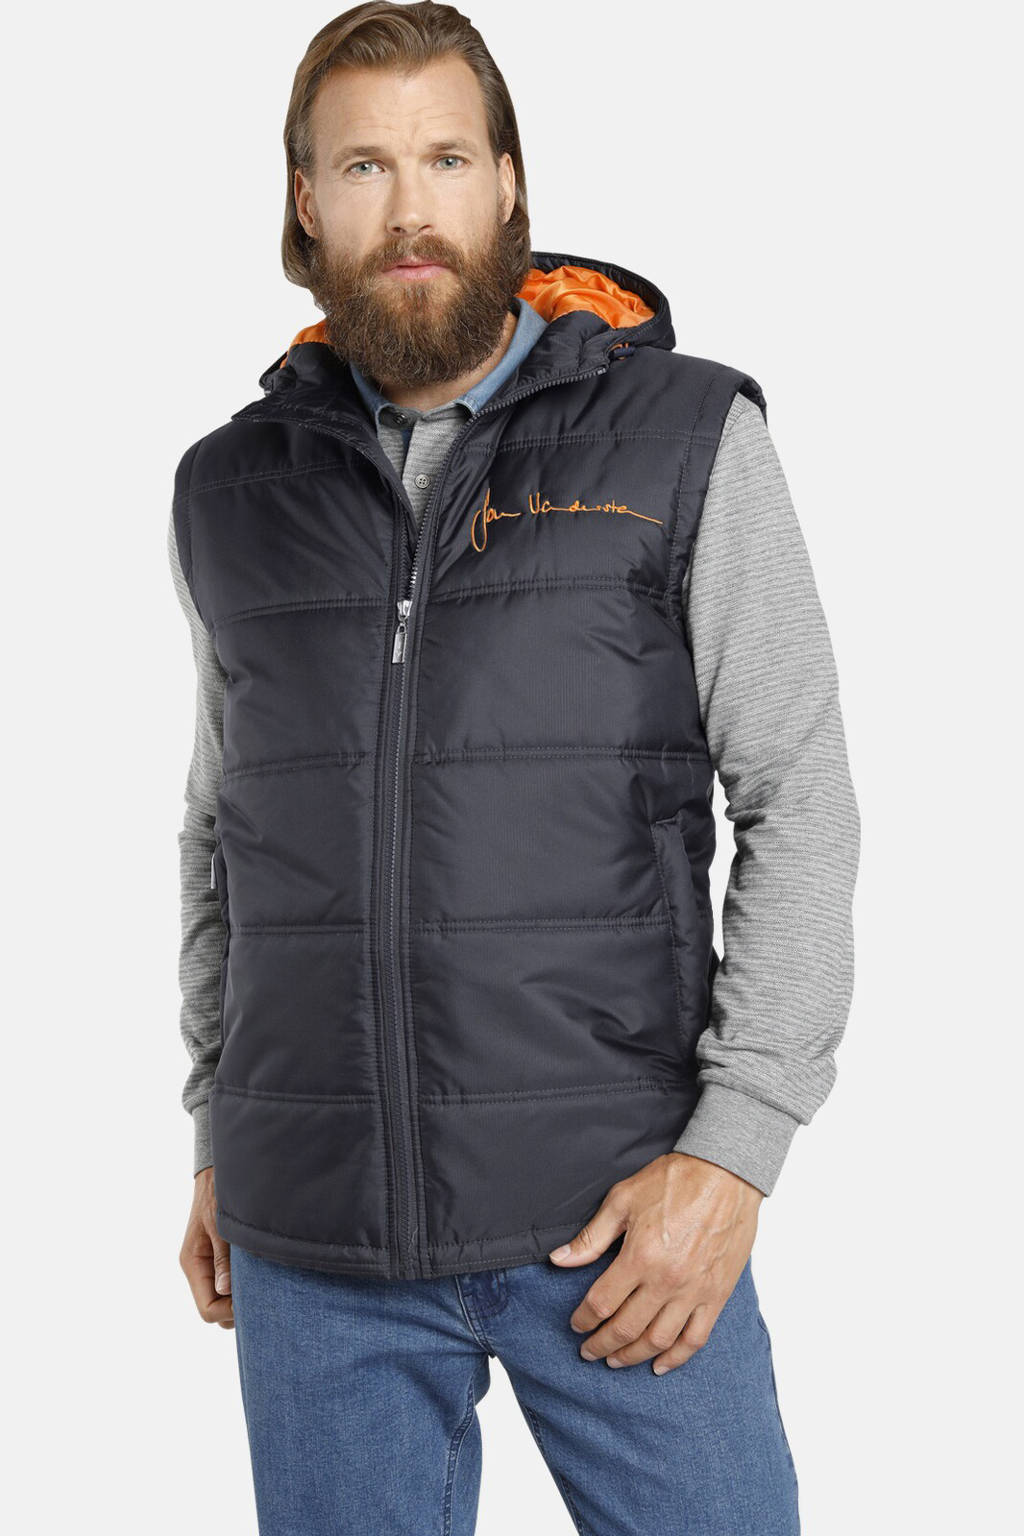 Jan Vanderstorm bodywarmer Plus Size Nithard donkerblauw/oranje, Donkerblauw/oranje